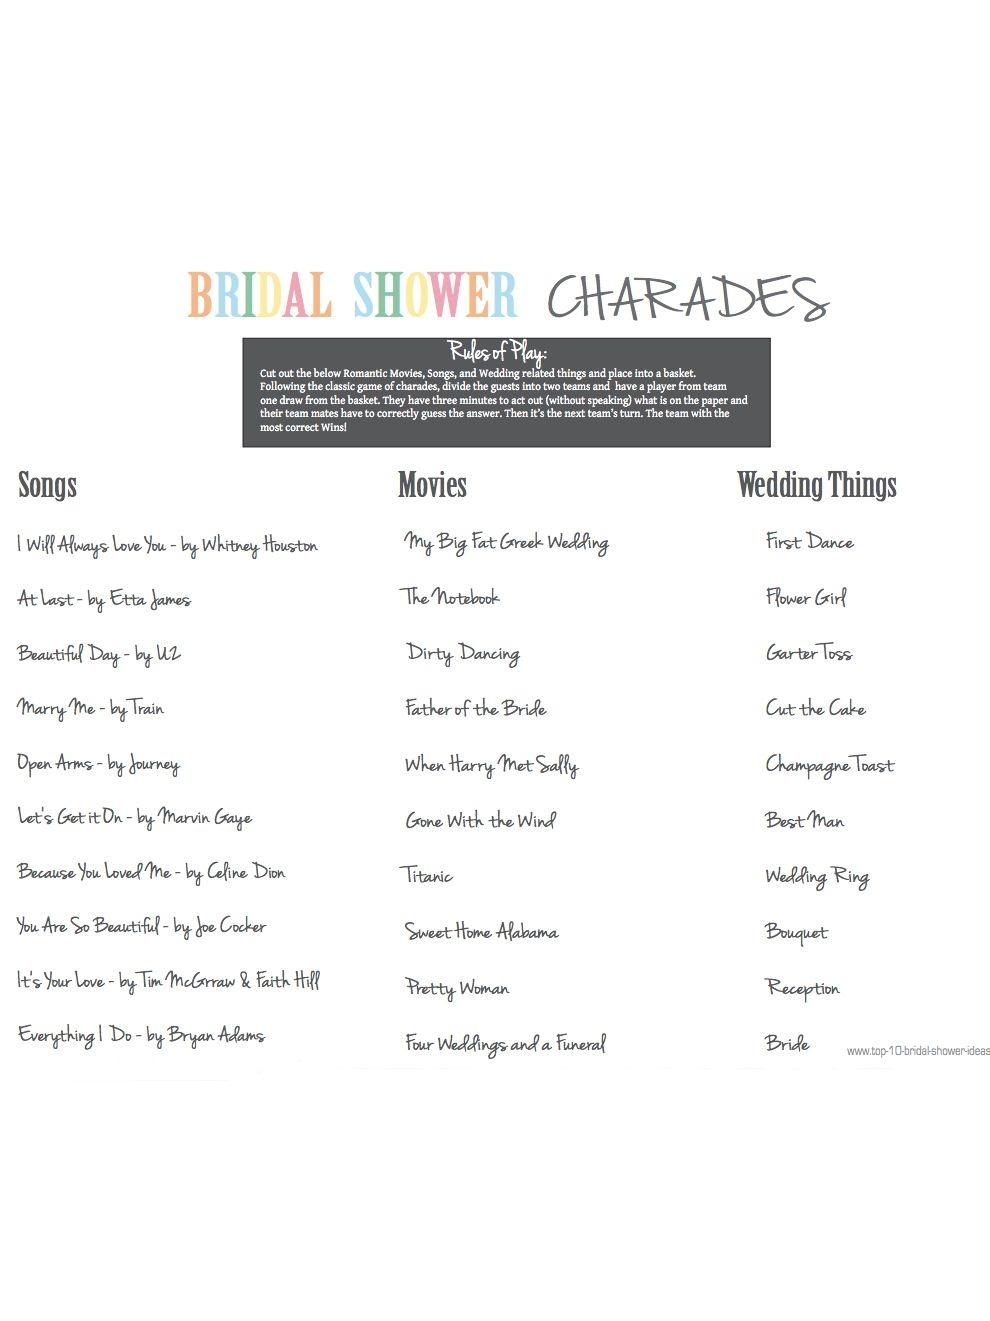 10 Printable Bridal Shower Games You Can Diy | Ashley's Wedding - Free Printable Wedding Shower Games